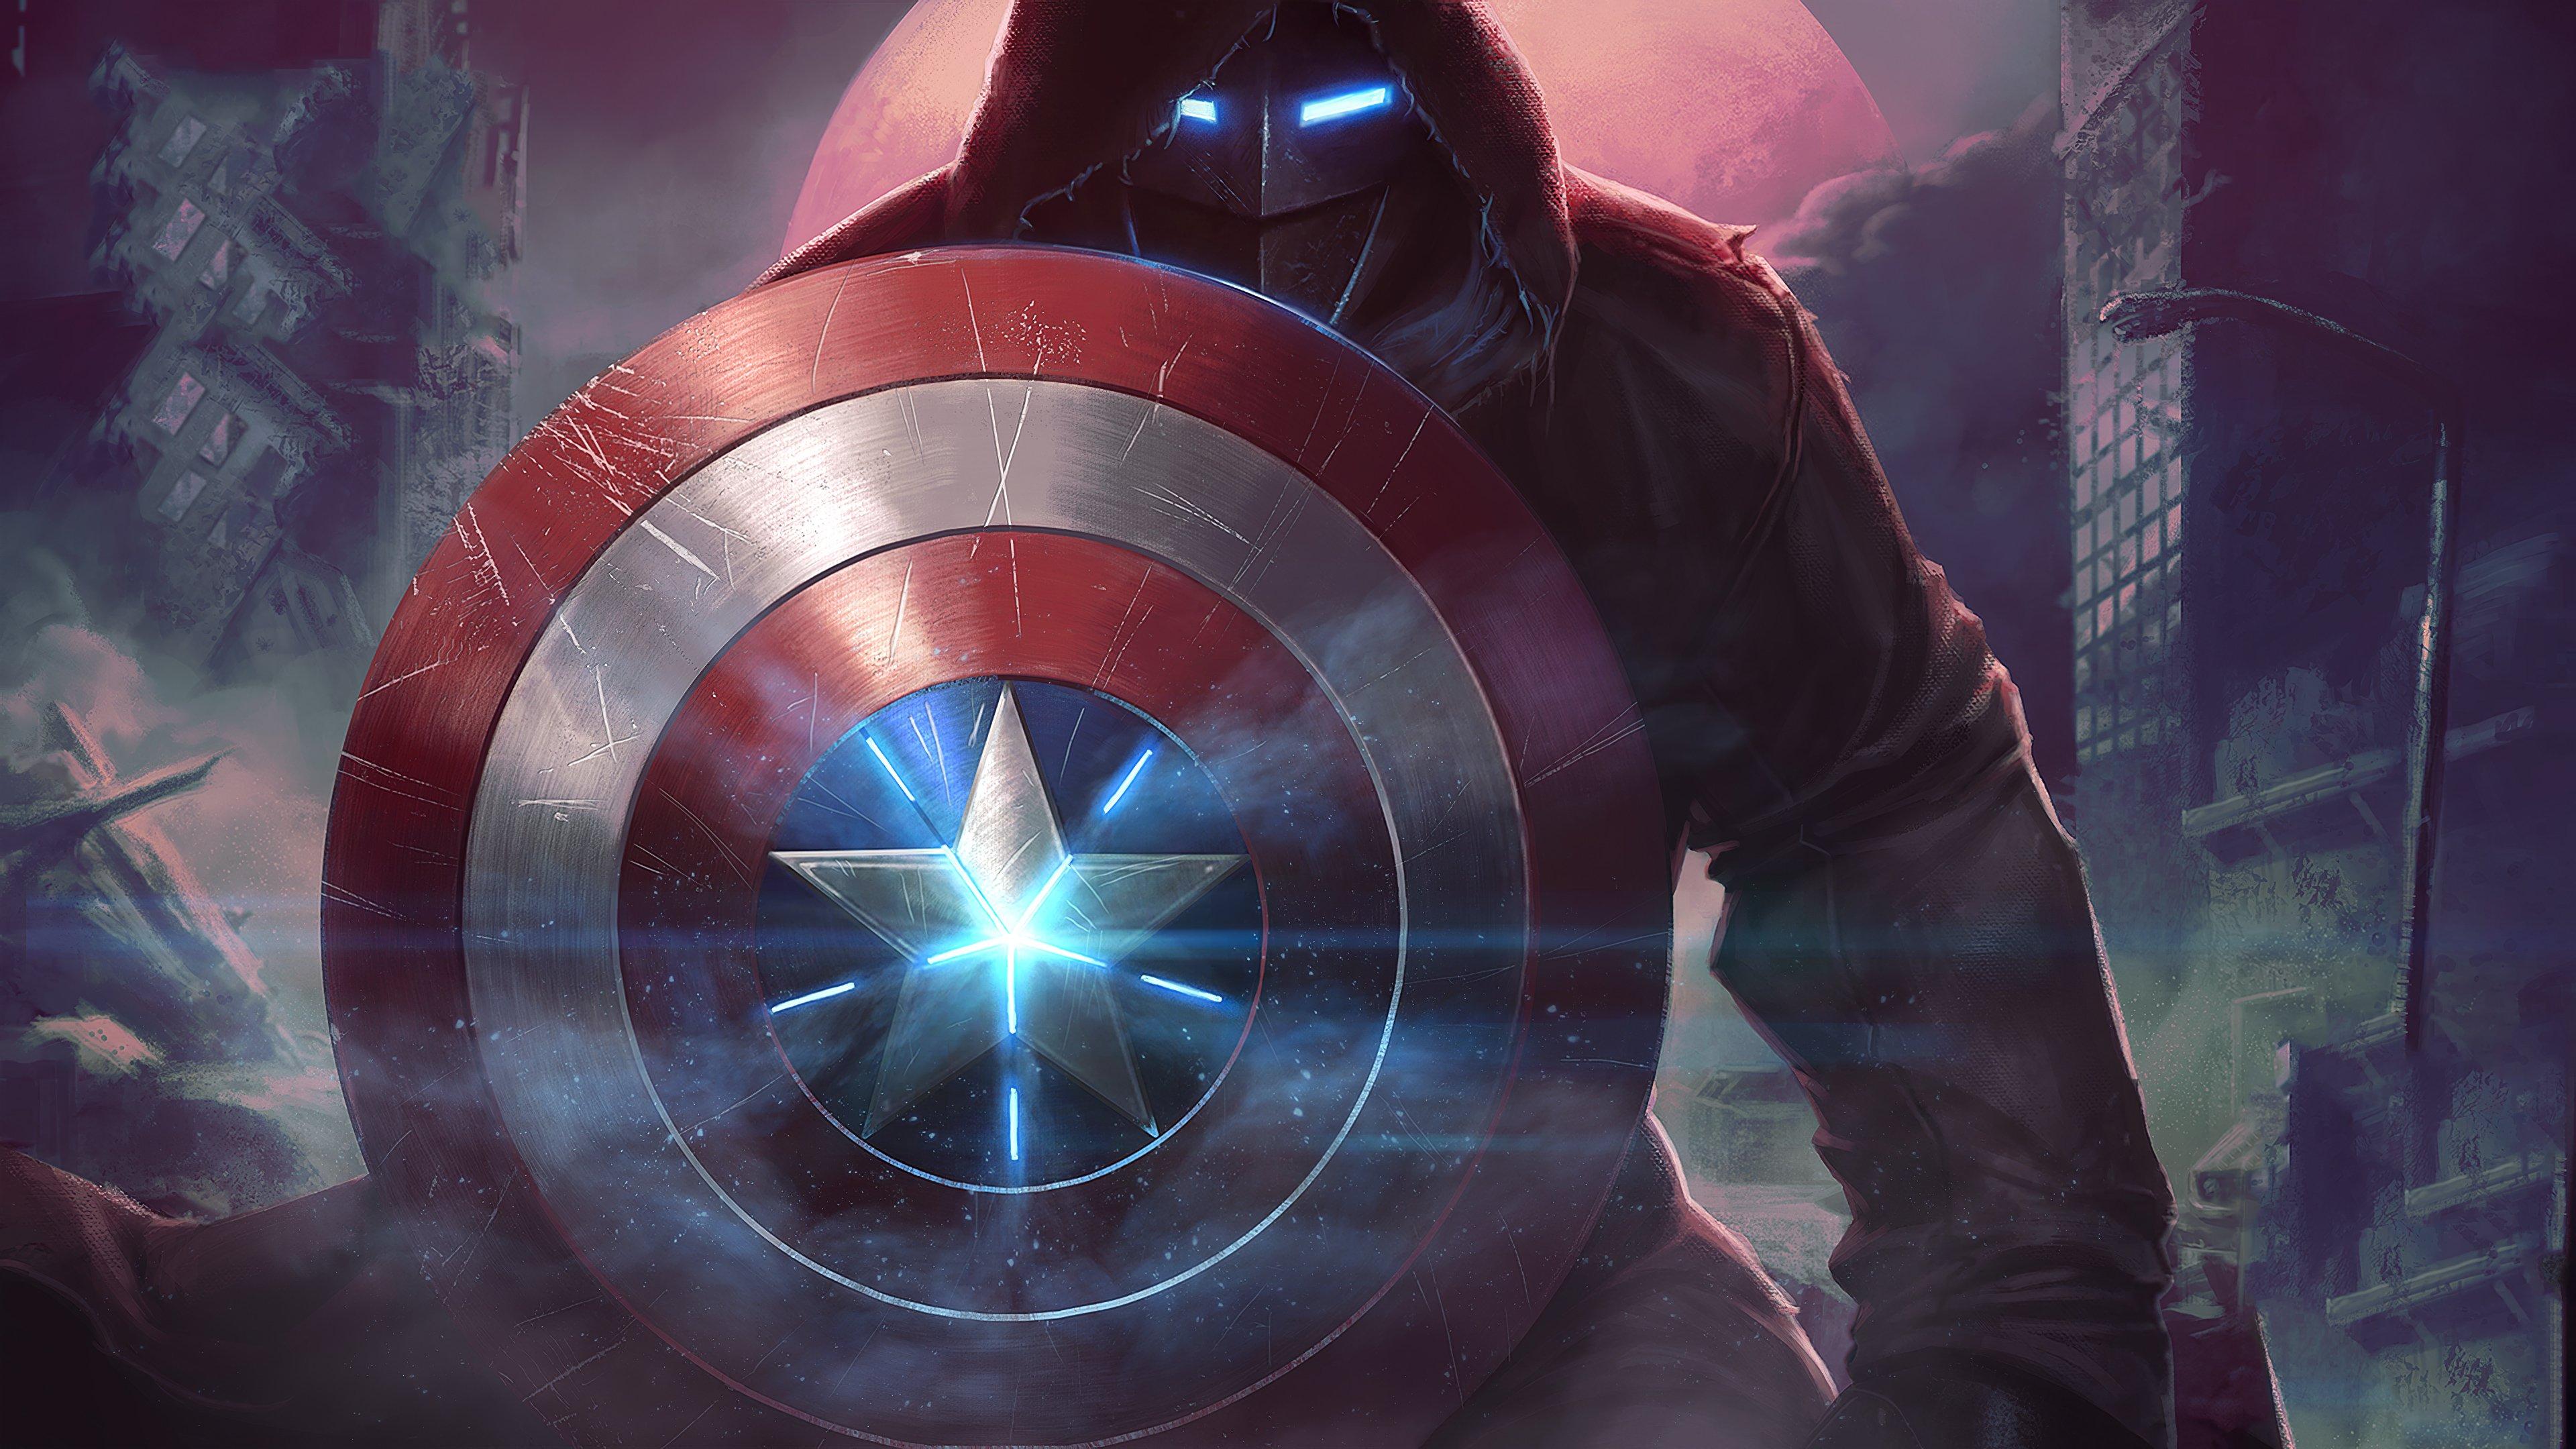 Fondos de pantalla Capitán America en Contest of Champions